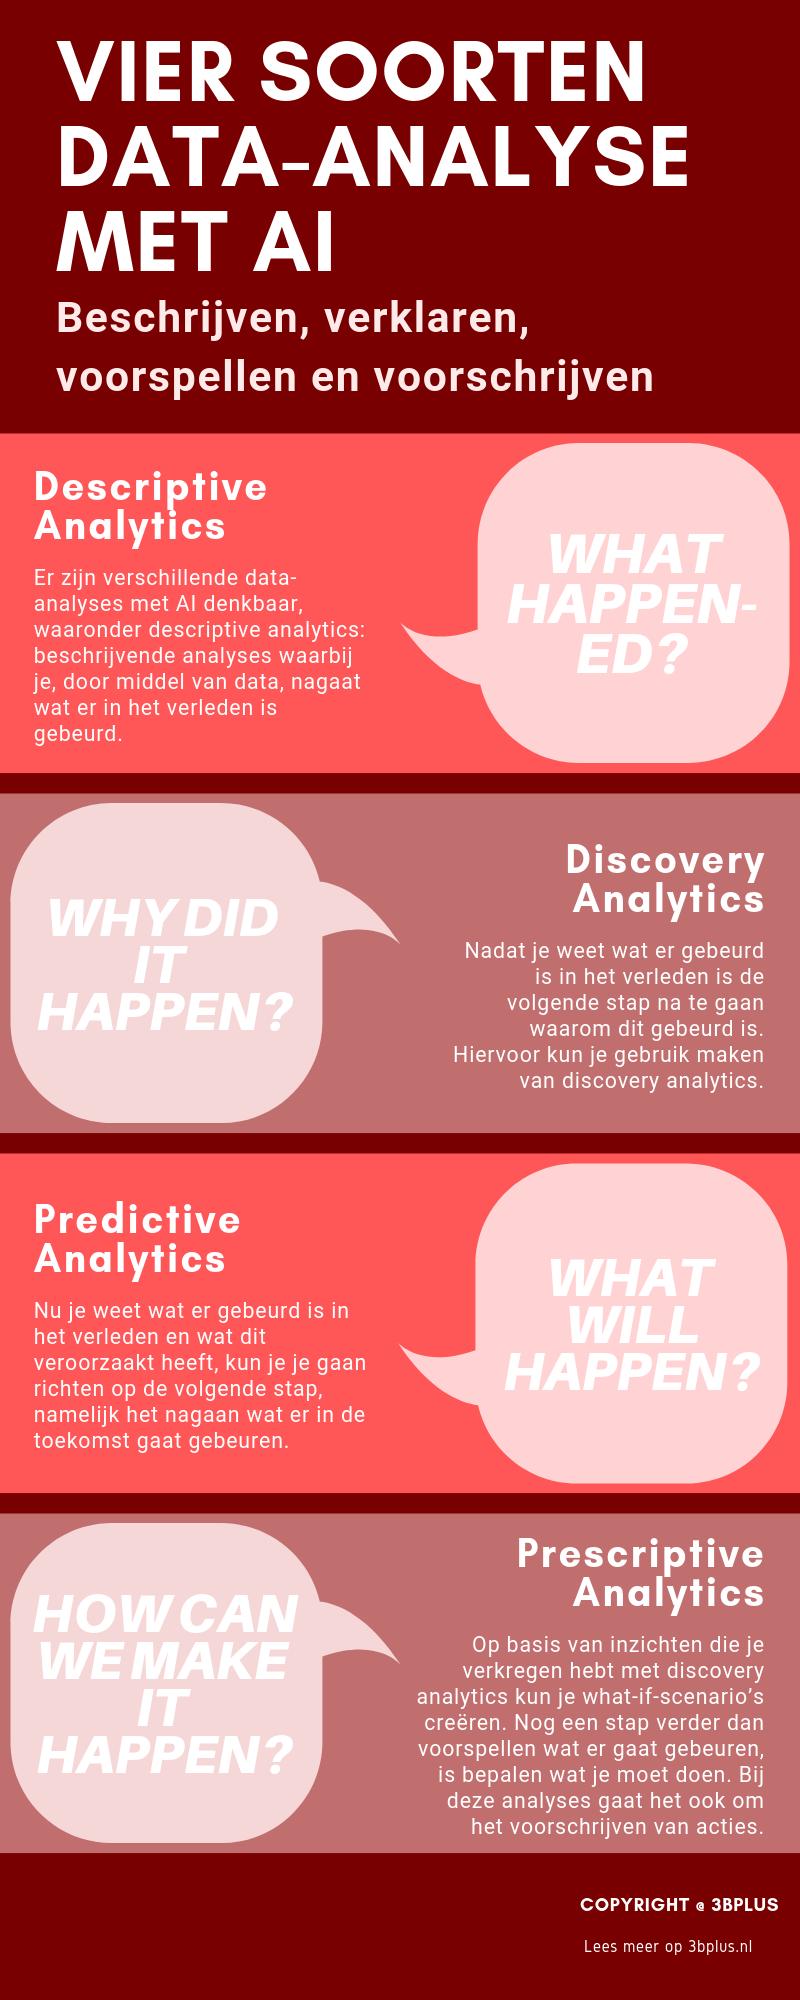 Vier soorten data-analyse met AI